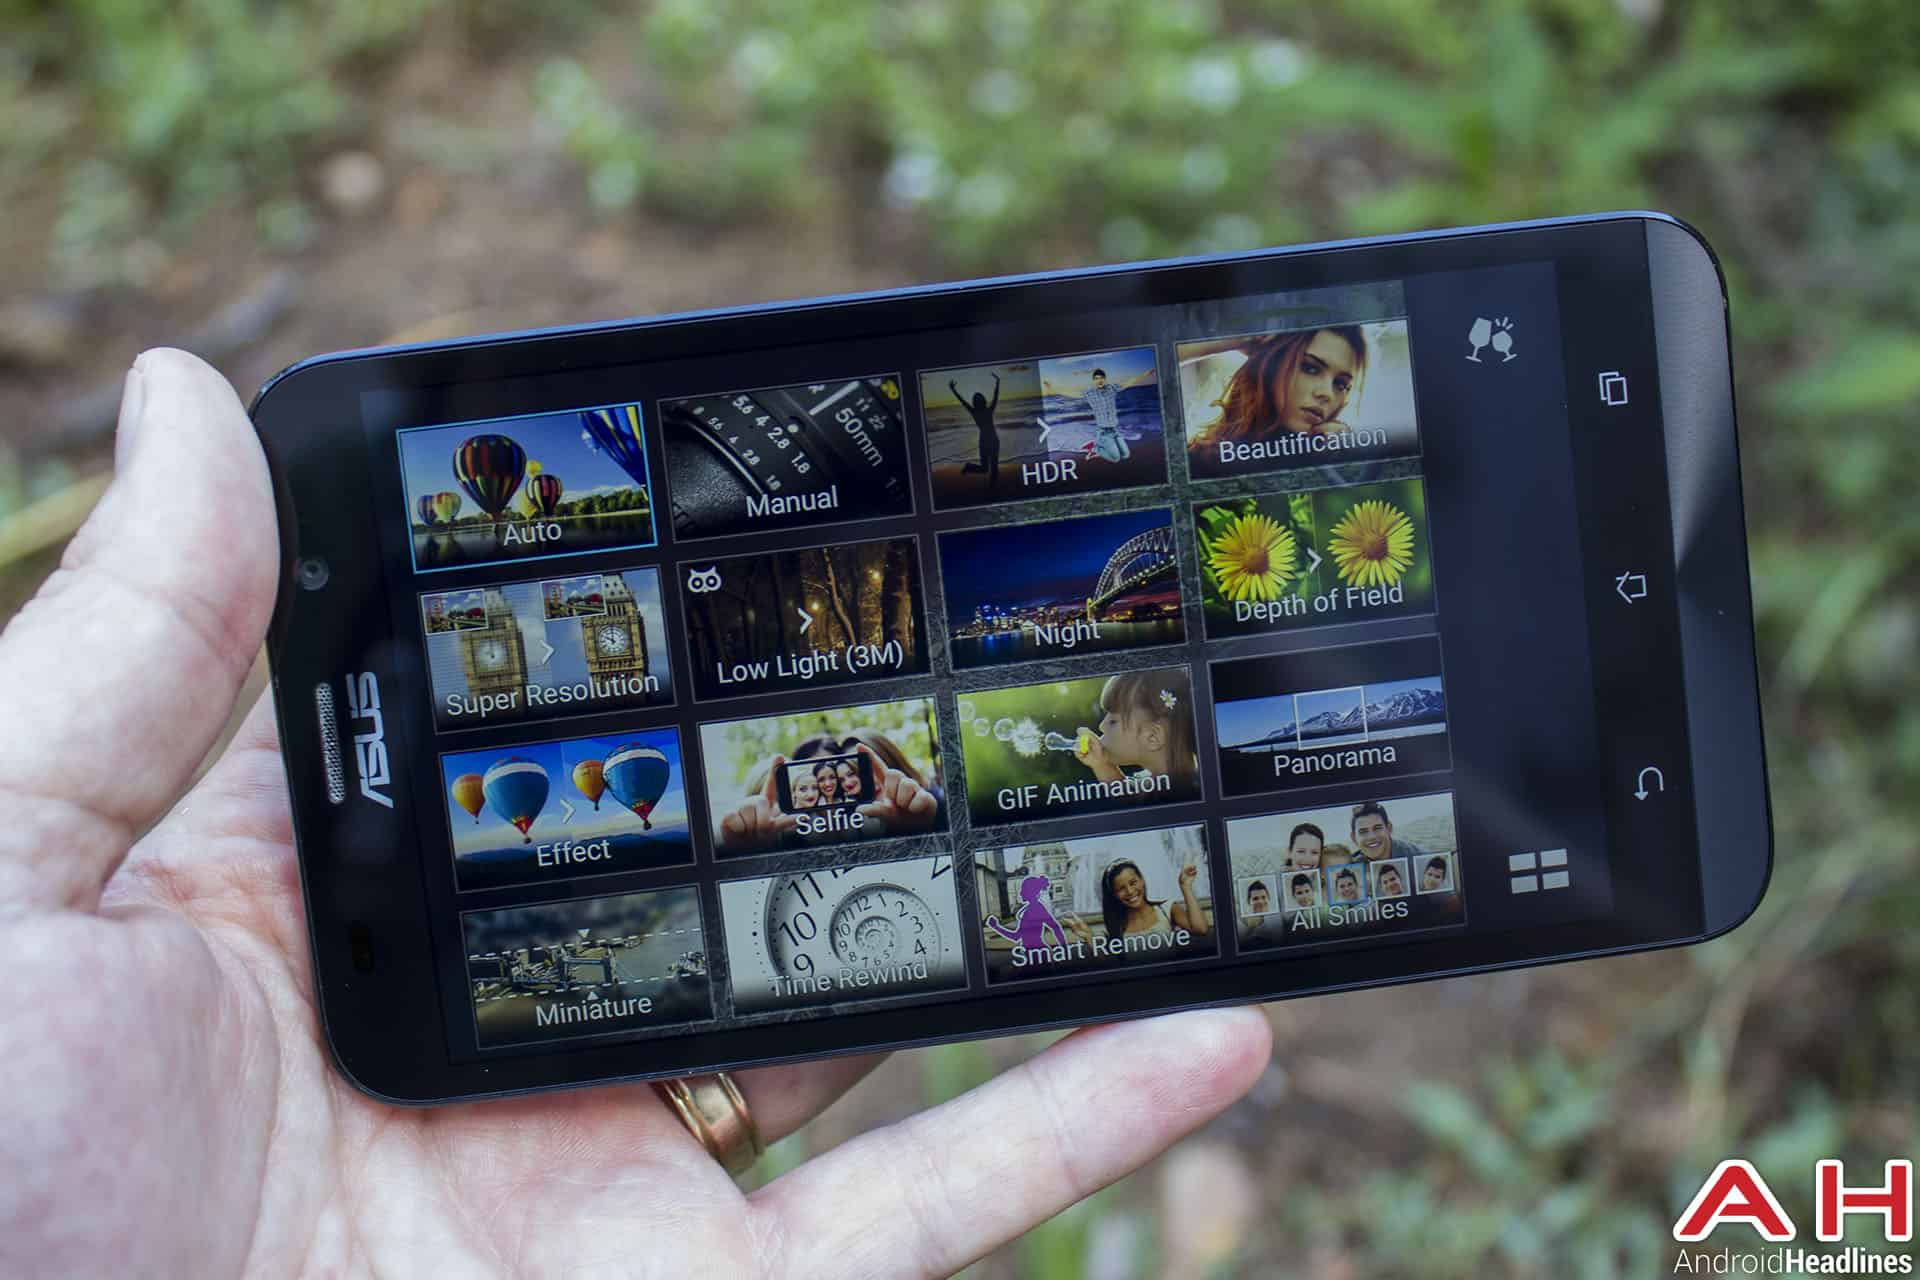 Asus-zenfone-2-camera-modes